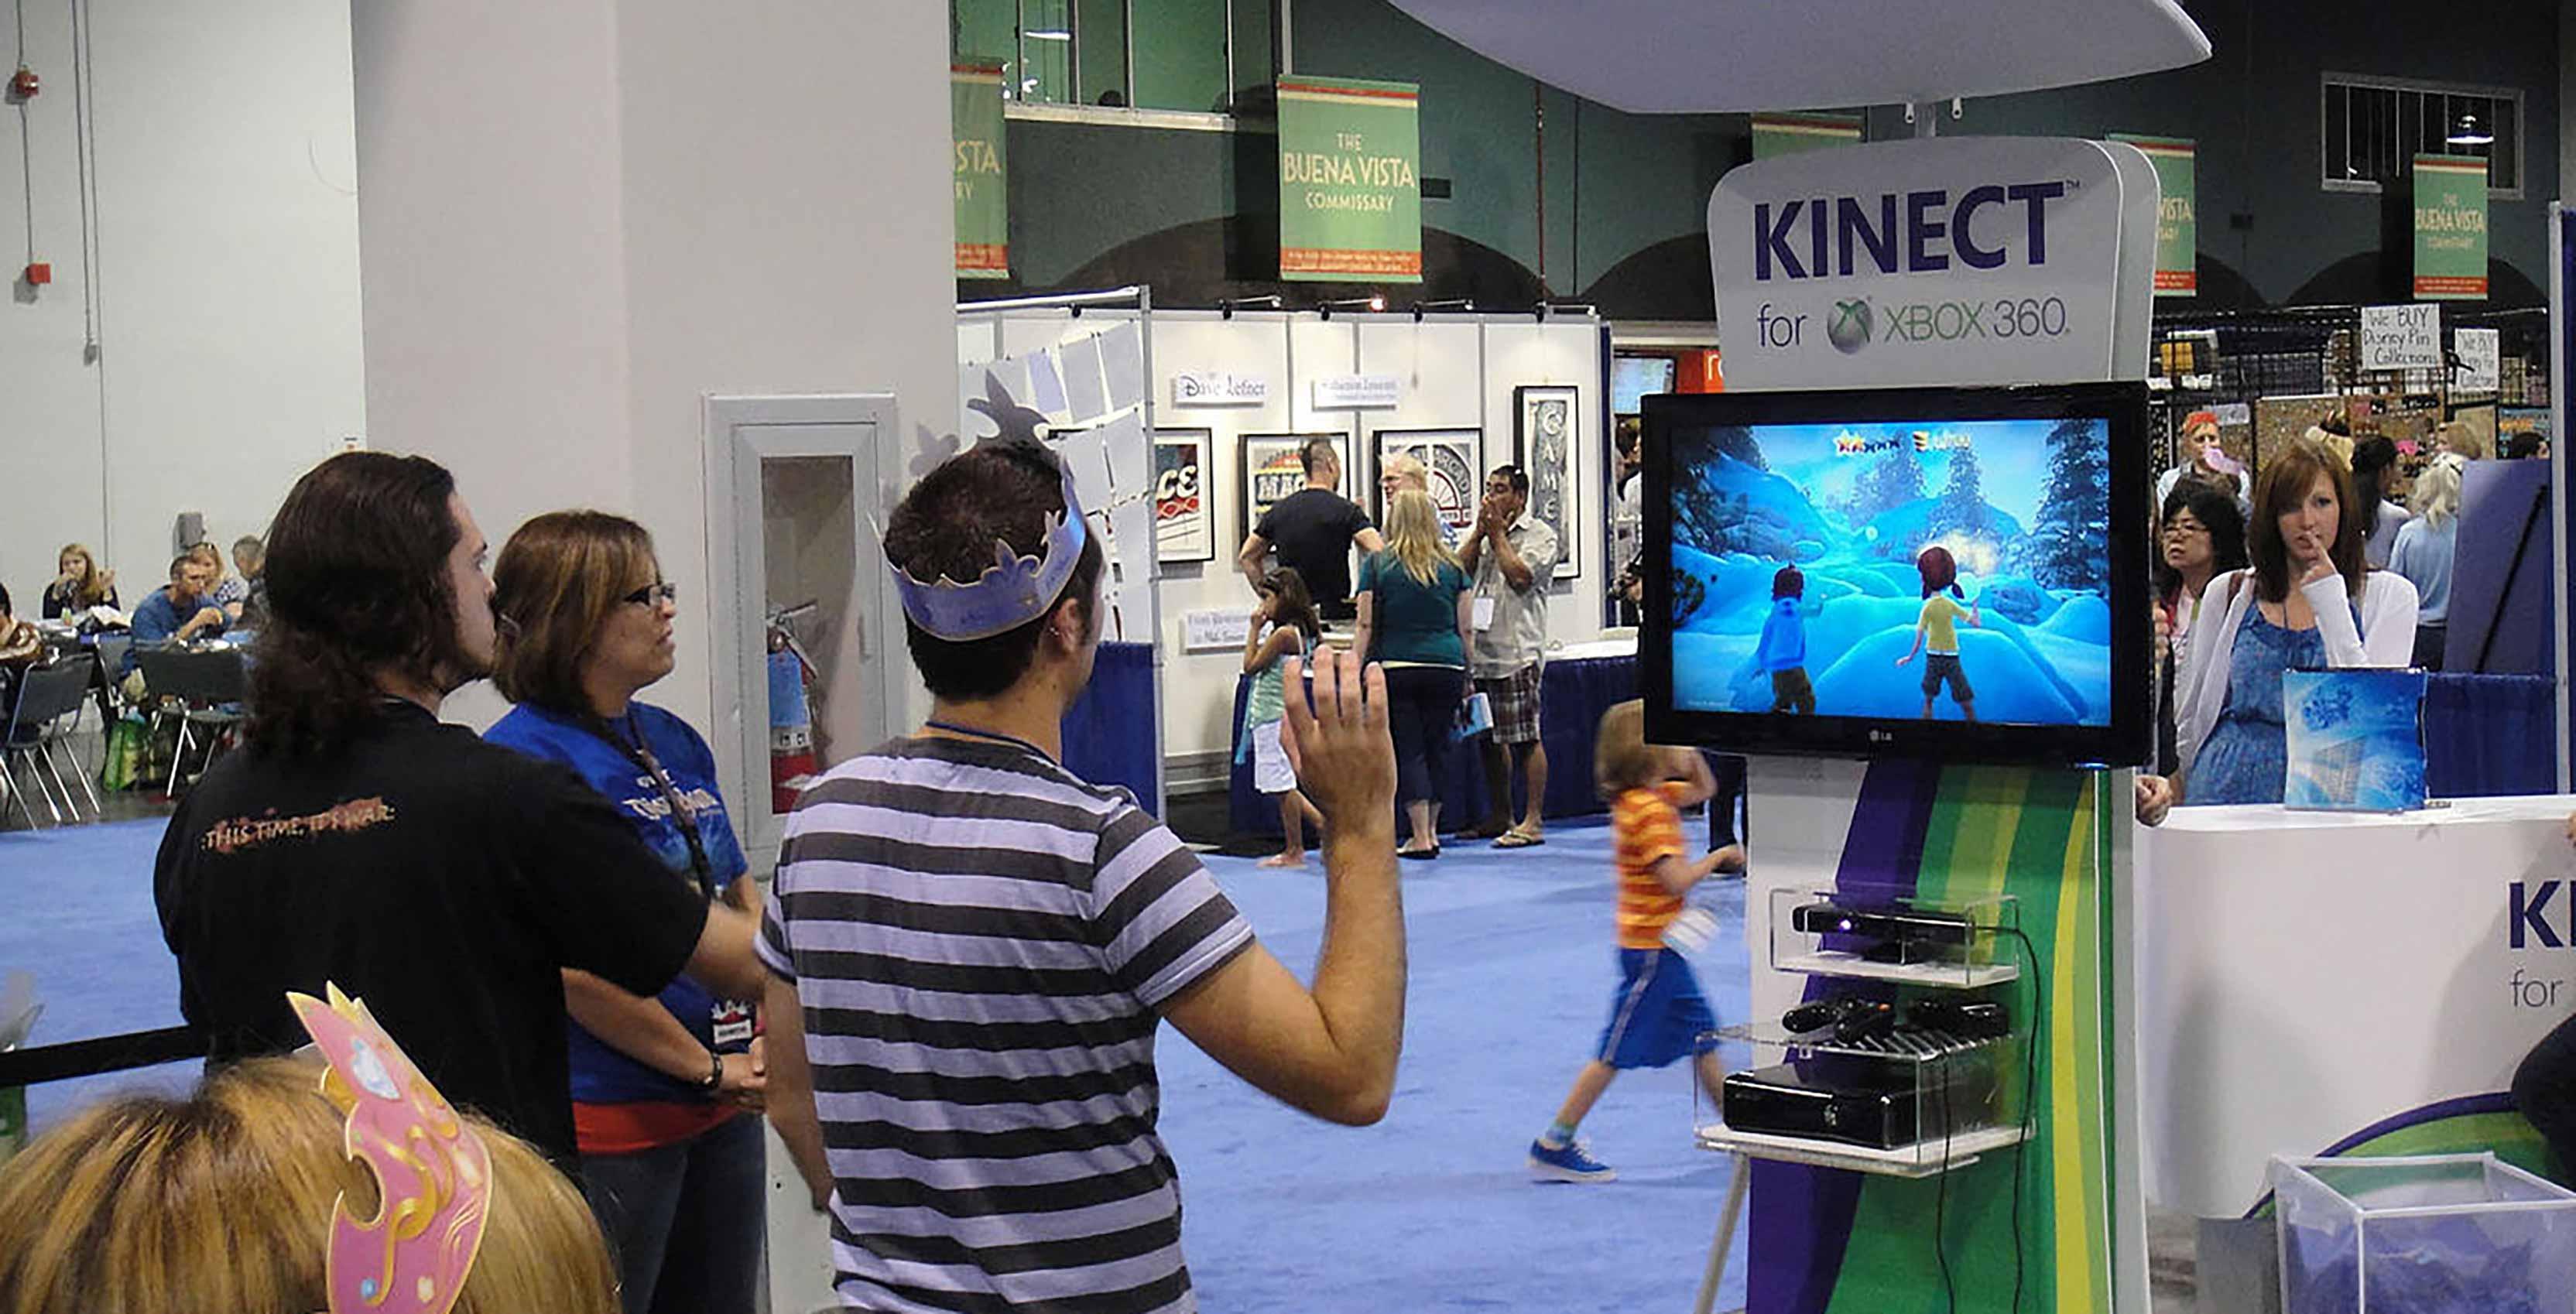 Kinect Disney game demonstration